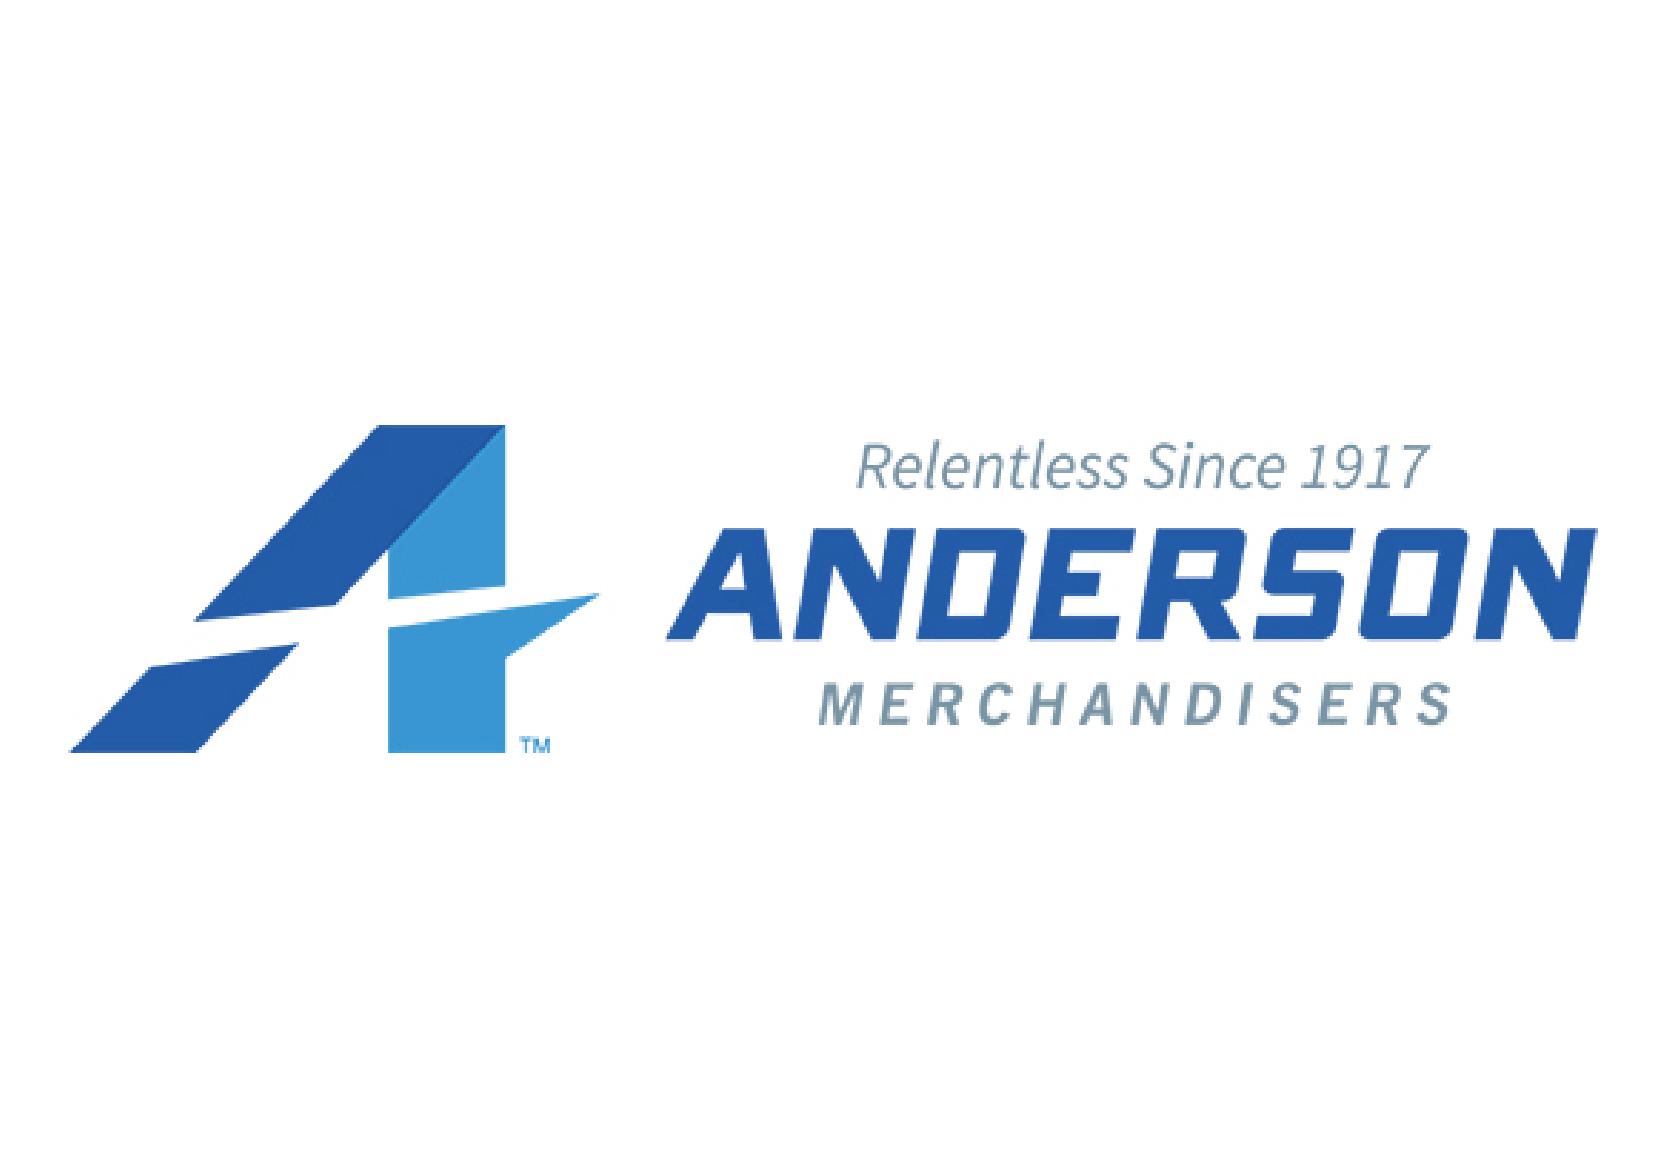 Anderson Merchandisers